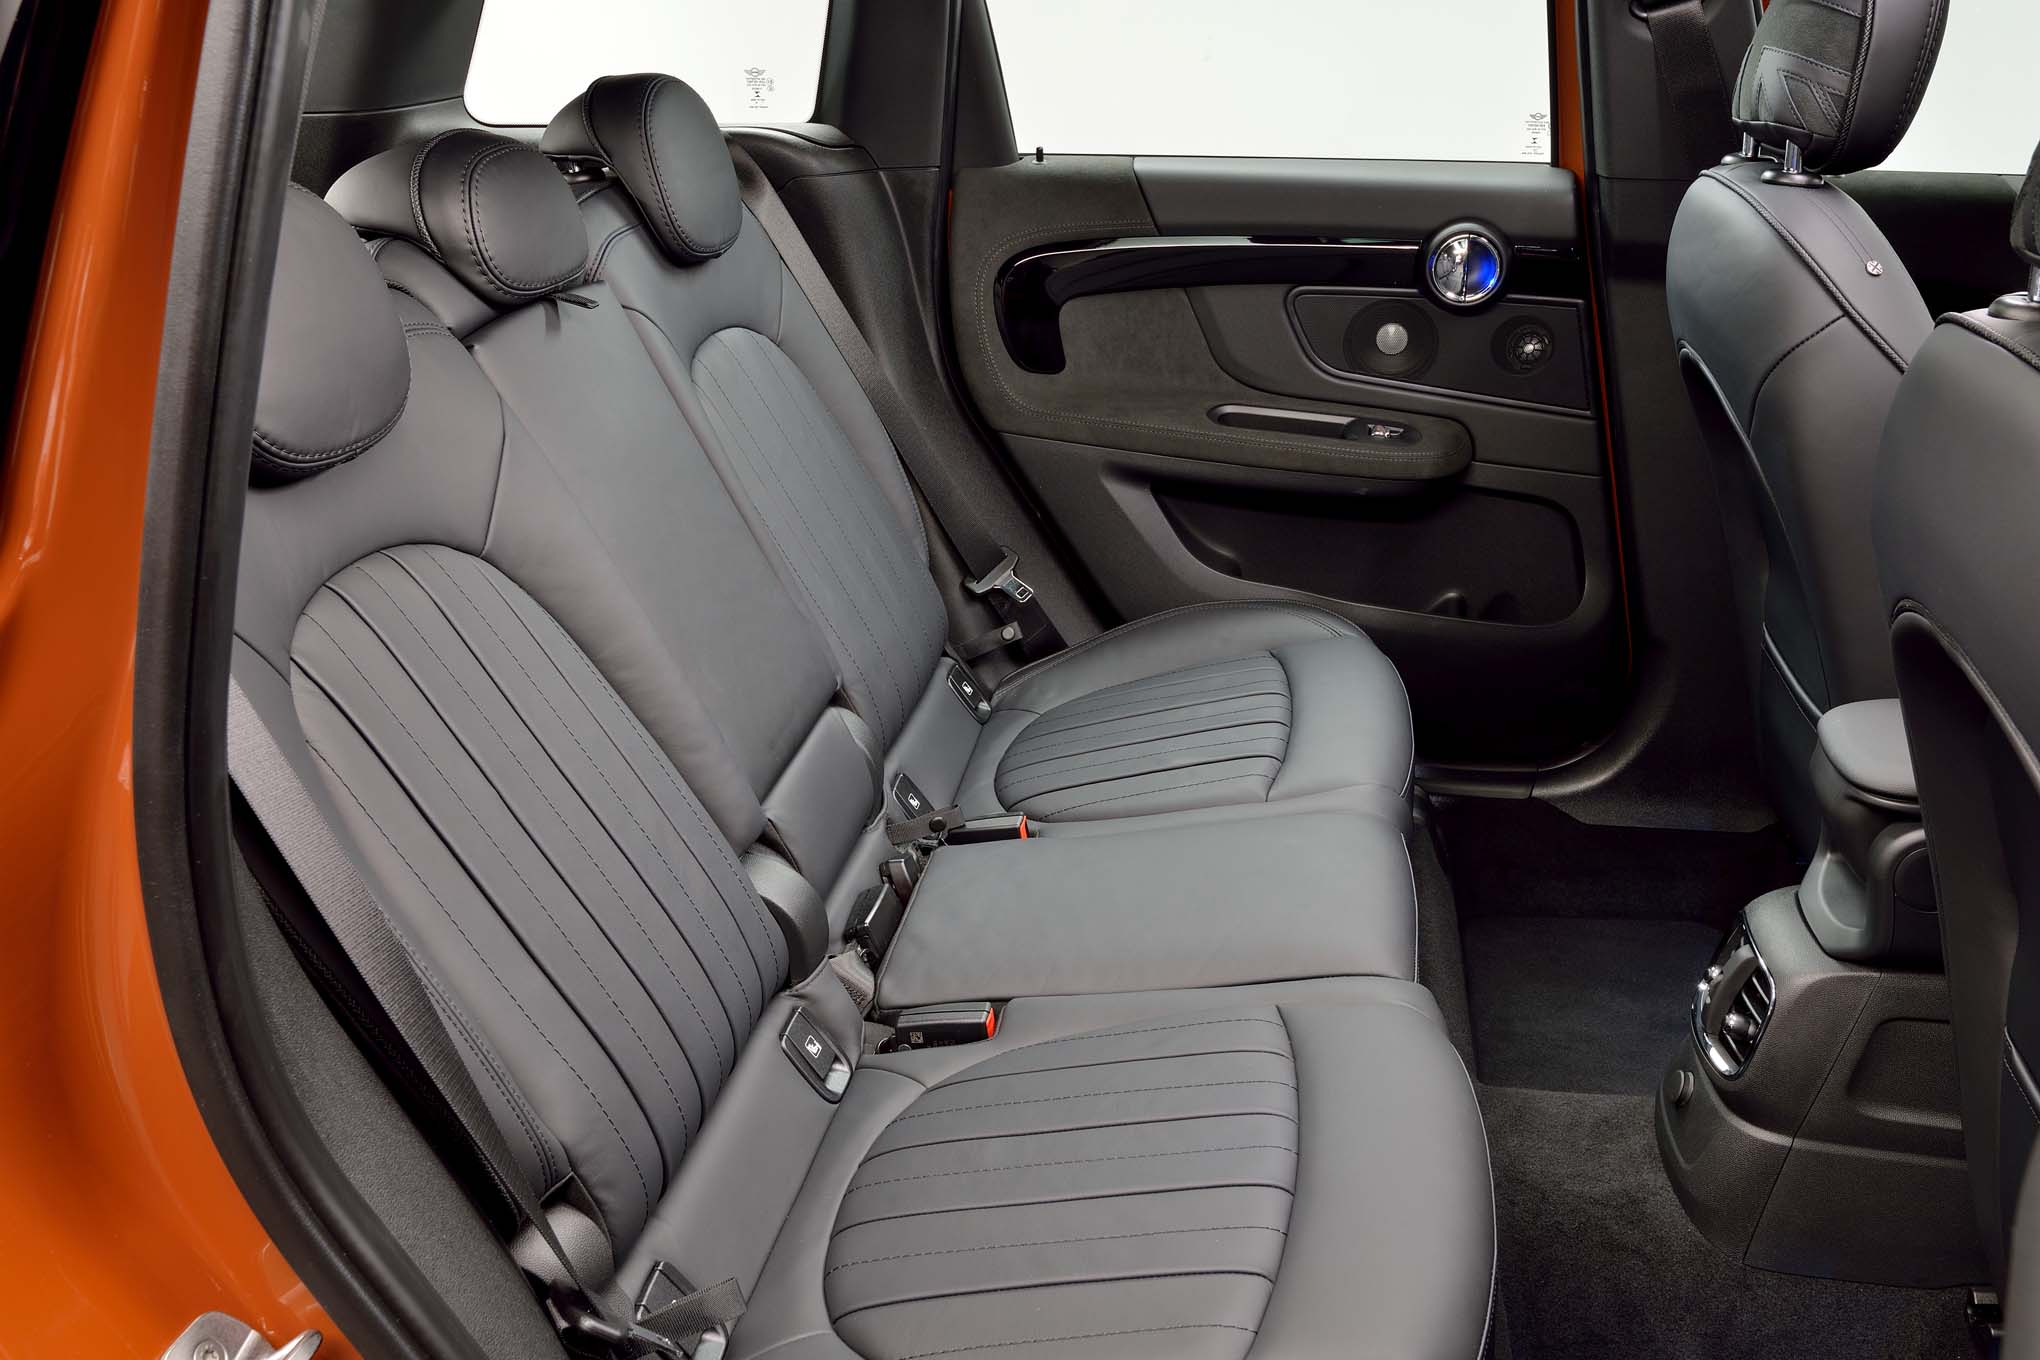 MINI Countryman I 2010 - 2016 SUV 5 door #5